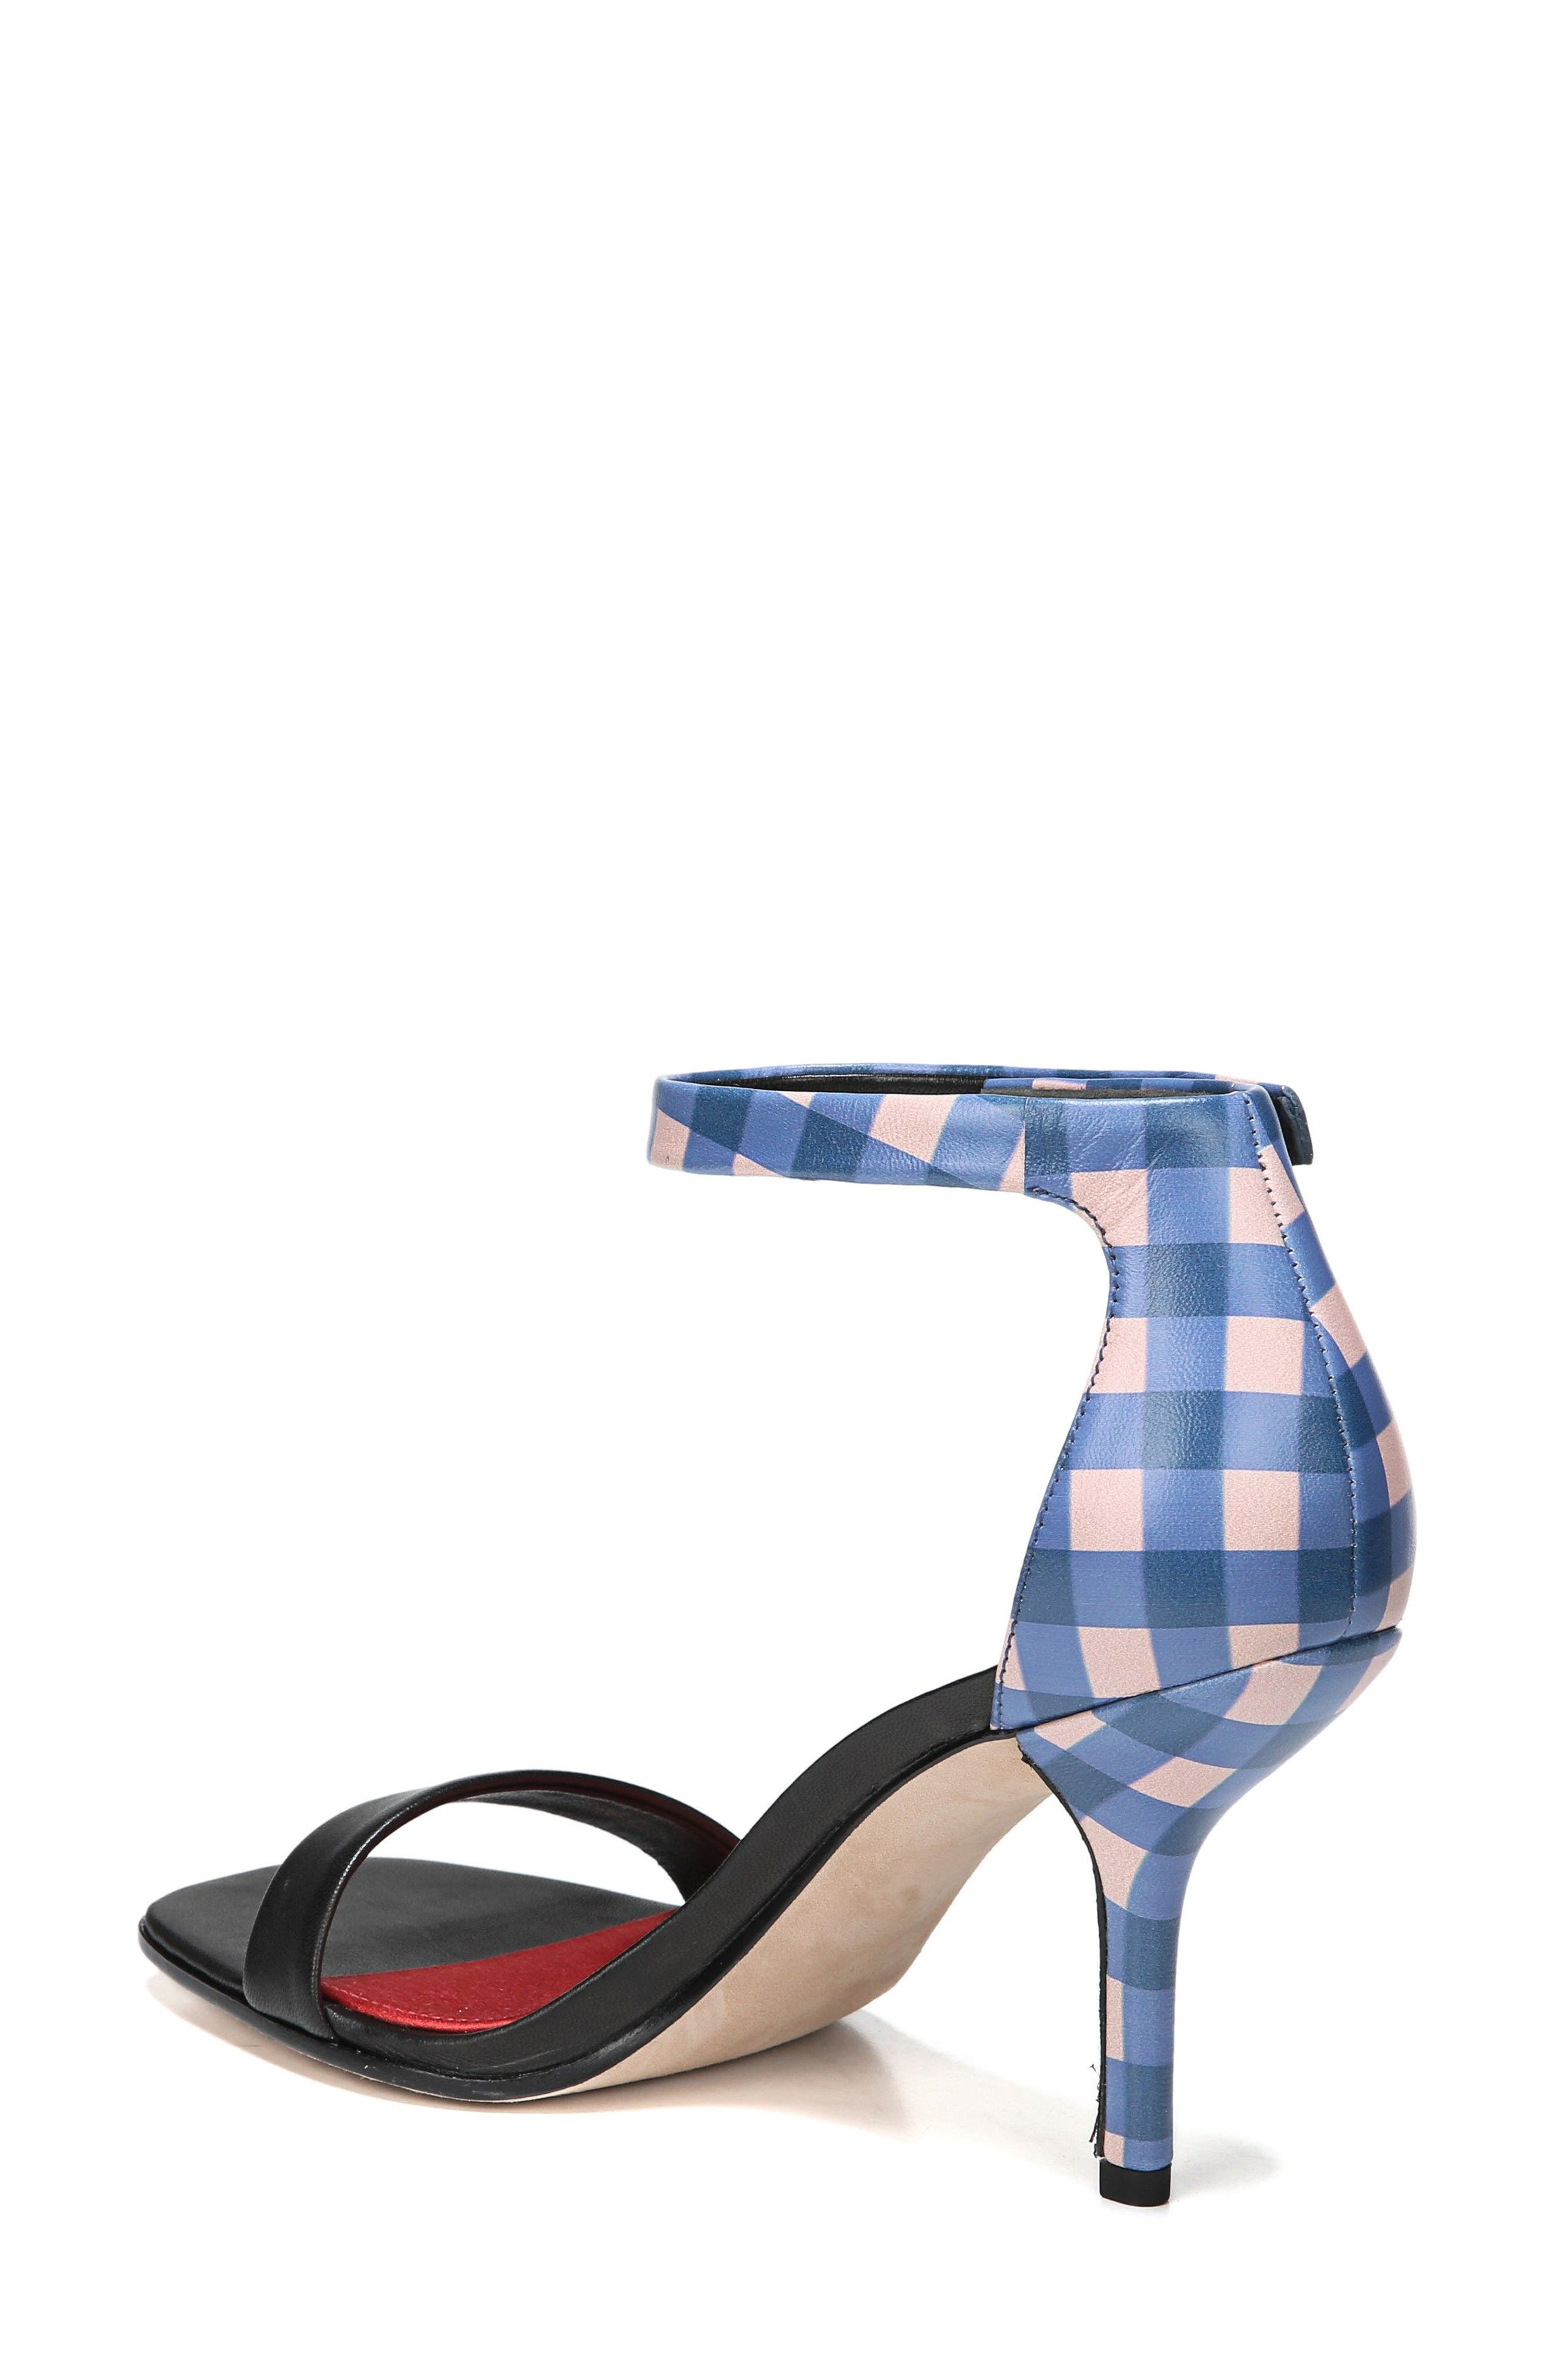 Alternate Image 2  - Diane Von Furstenberg Ferrara Ankle Strap Sandal (Women)